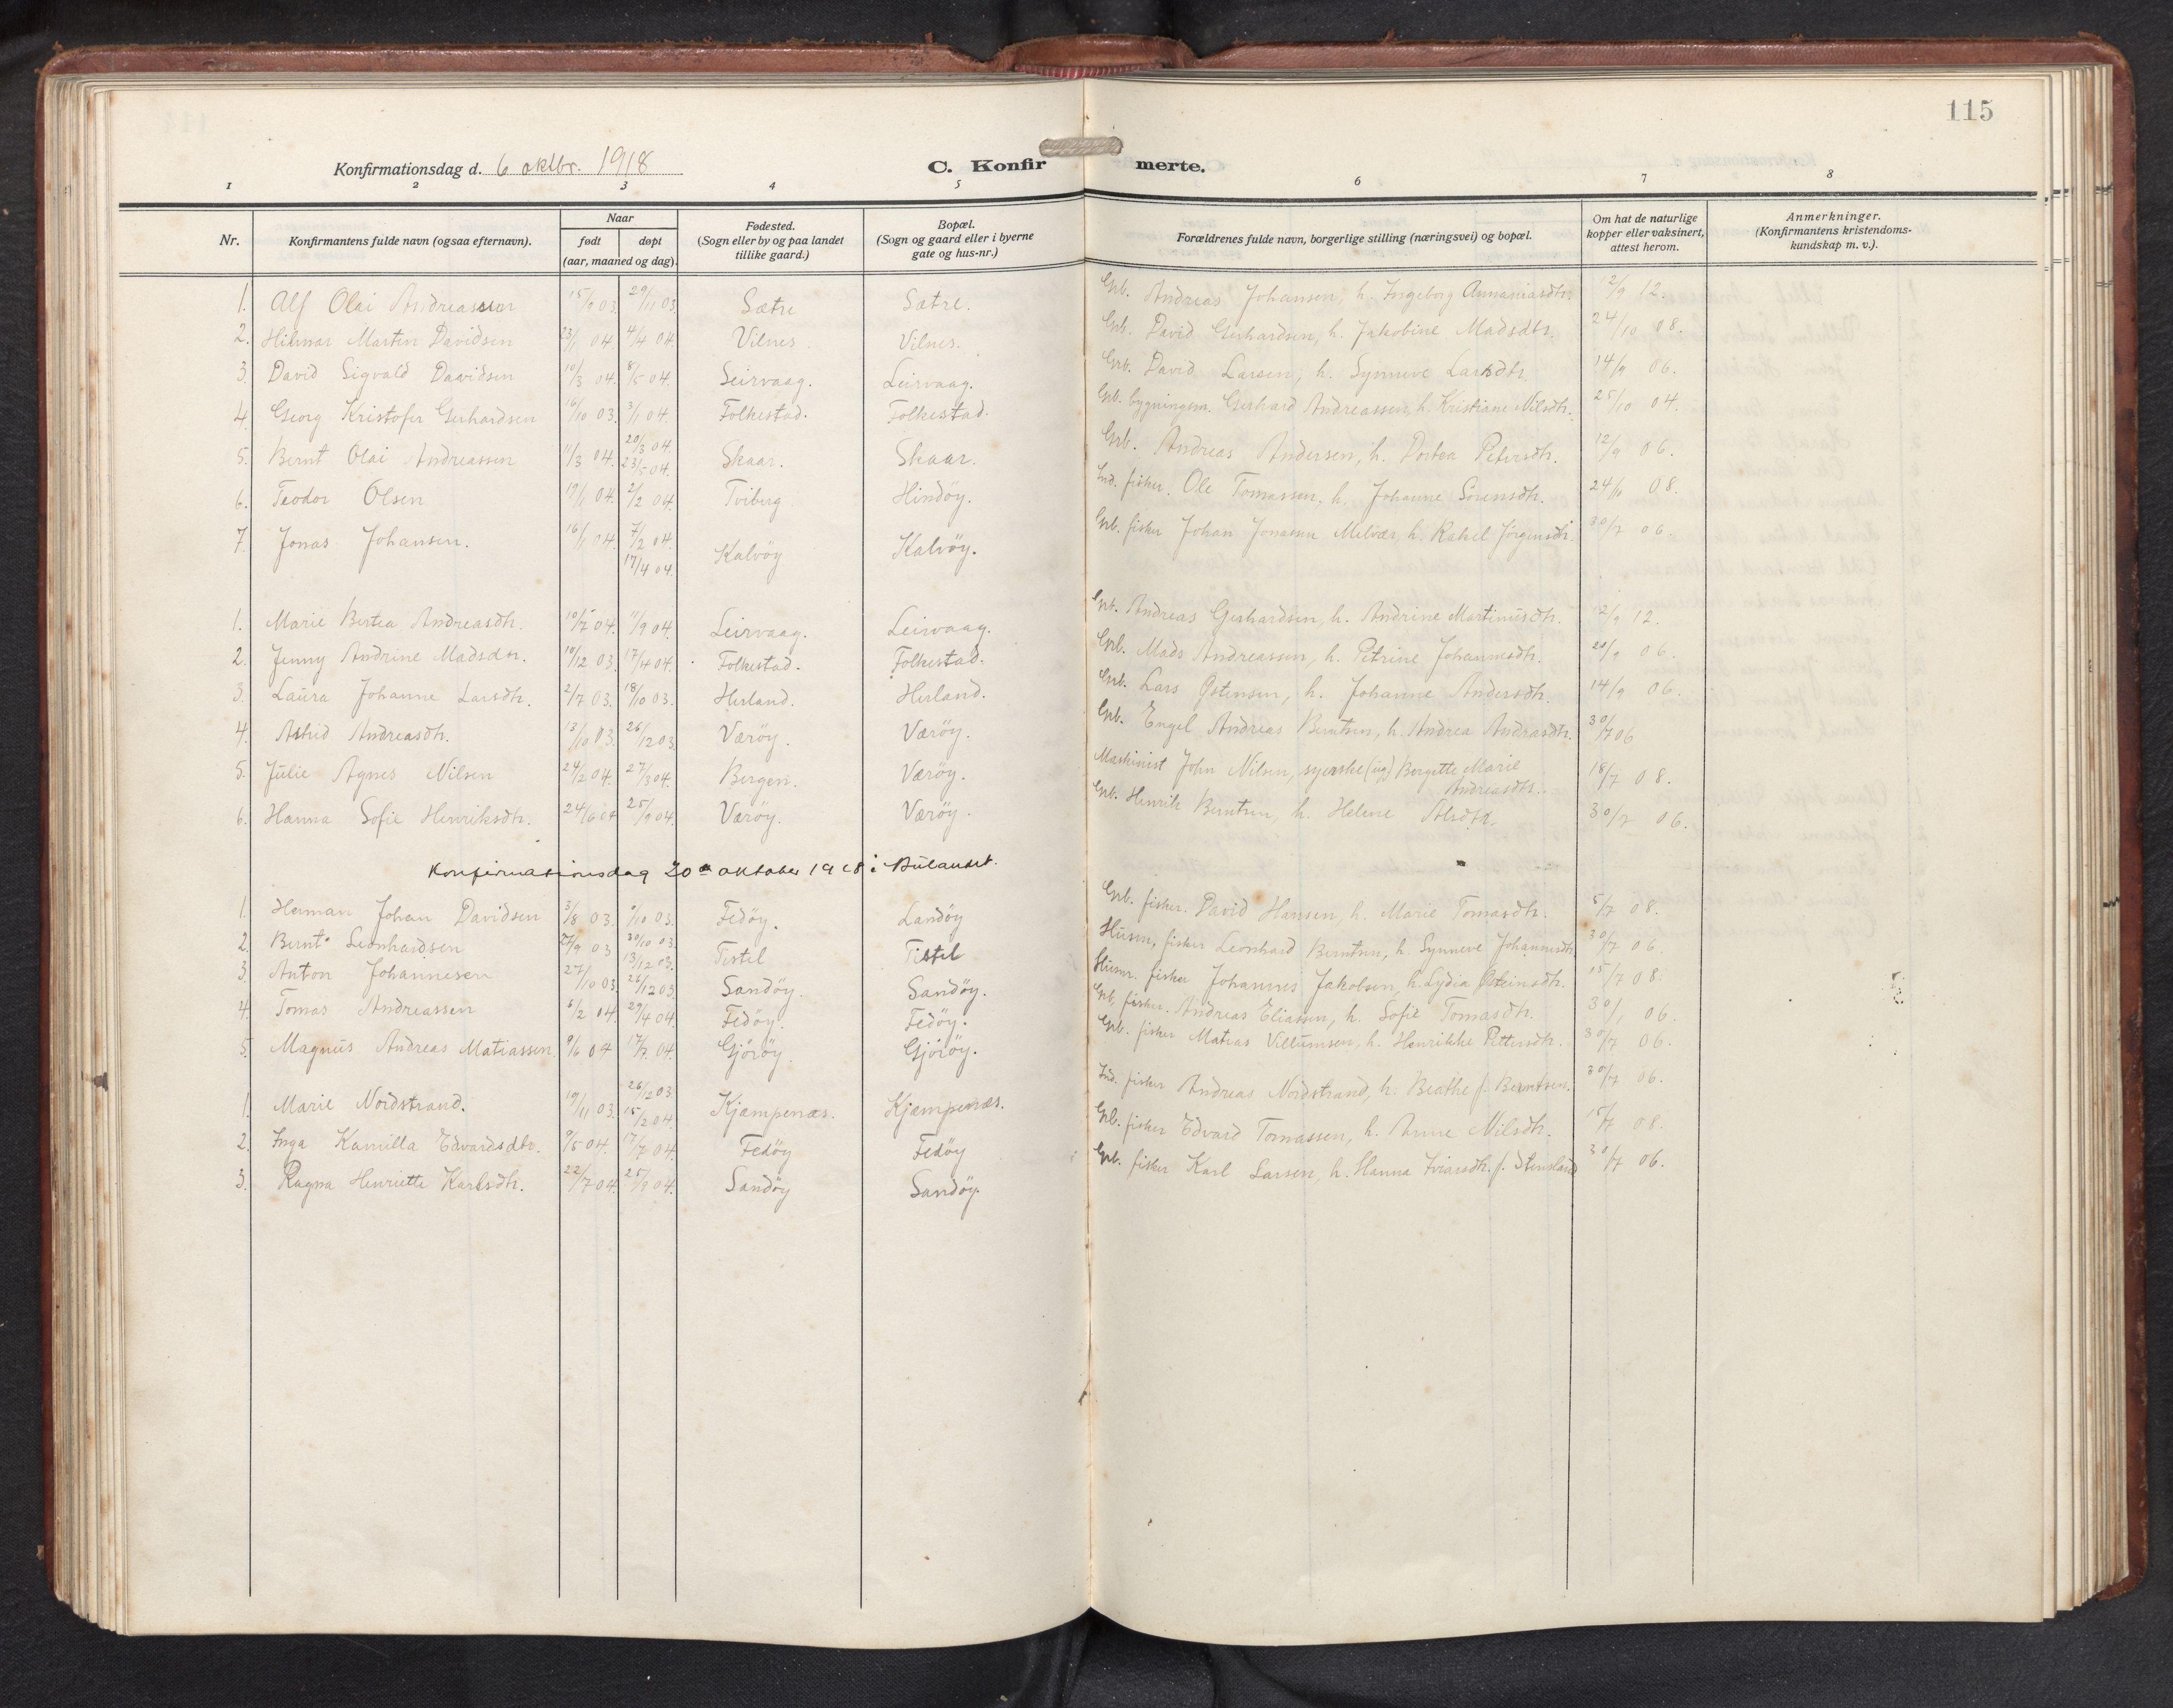 SAB, Askvoll sokneprestembete, H/Hab/Habb/L0002: Klokkerbok nr. B 2, 1910-1947, s. 114b-115a